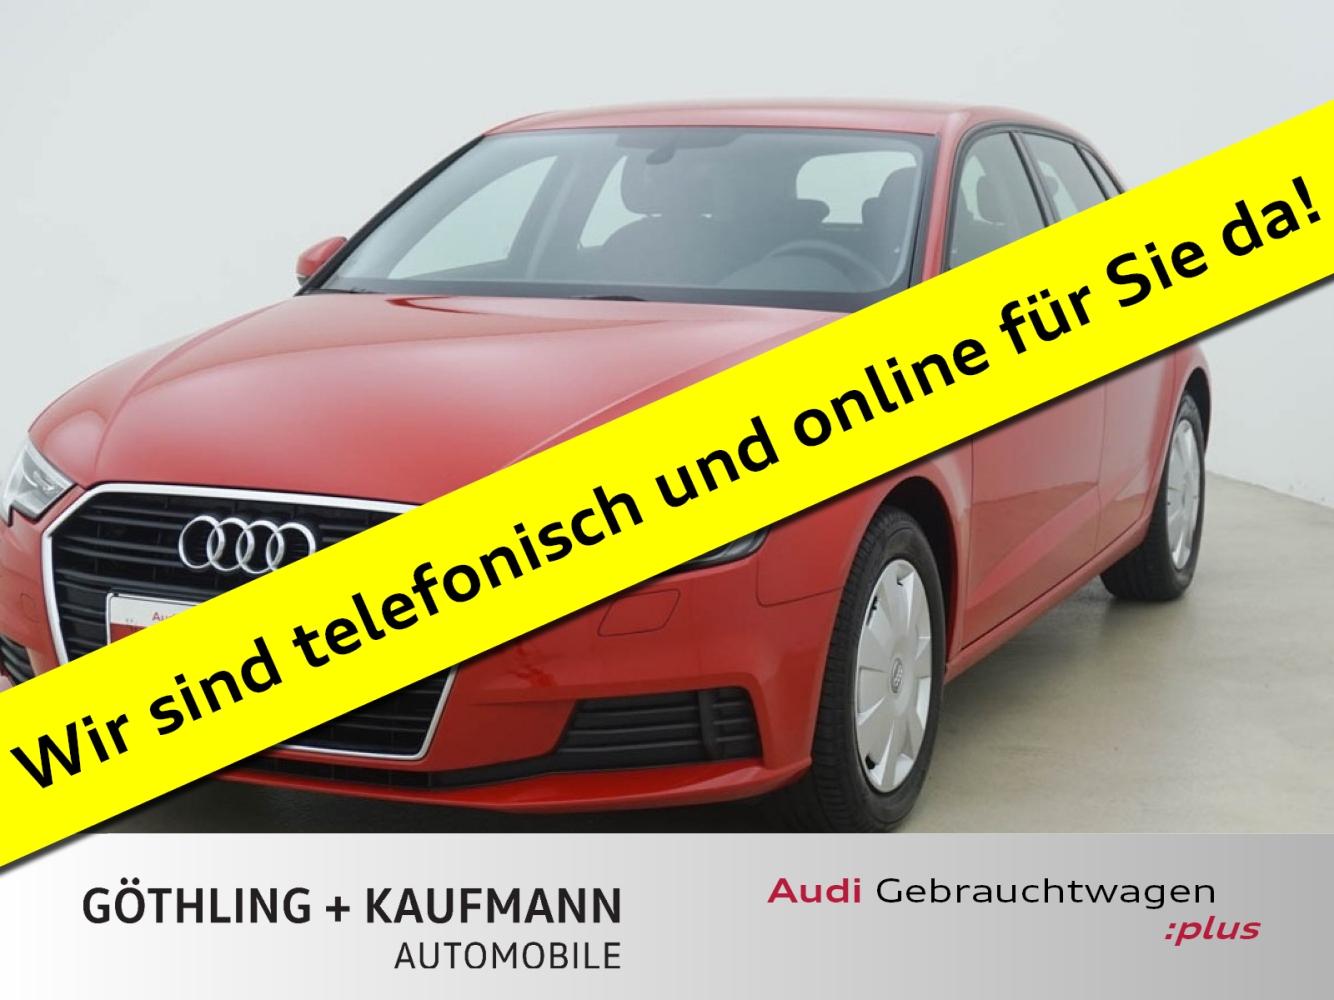 Audi A3 Sportback 1.4 TFSI 110kW*AHK*Xenon+*Bluet*PDC, Jahr 2017, Benzin